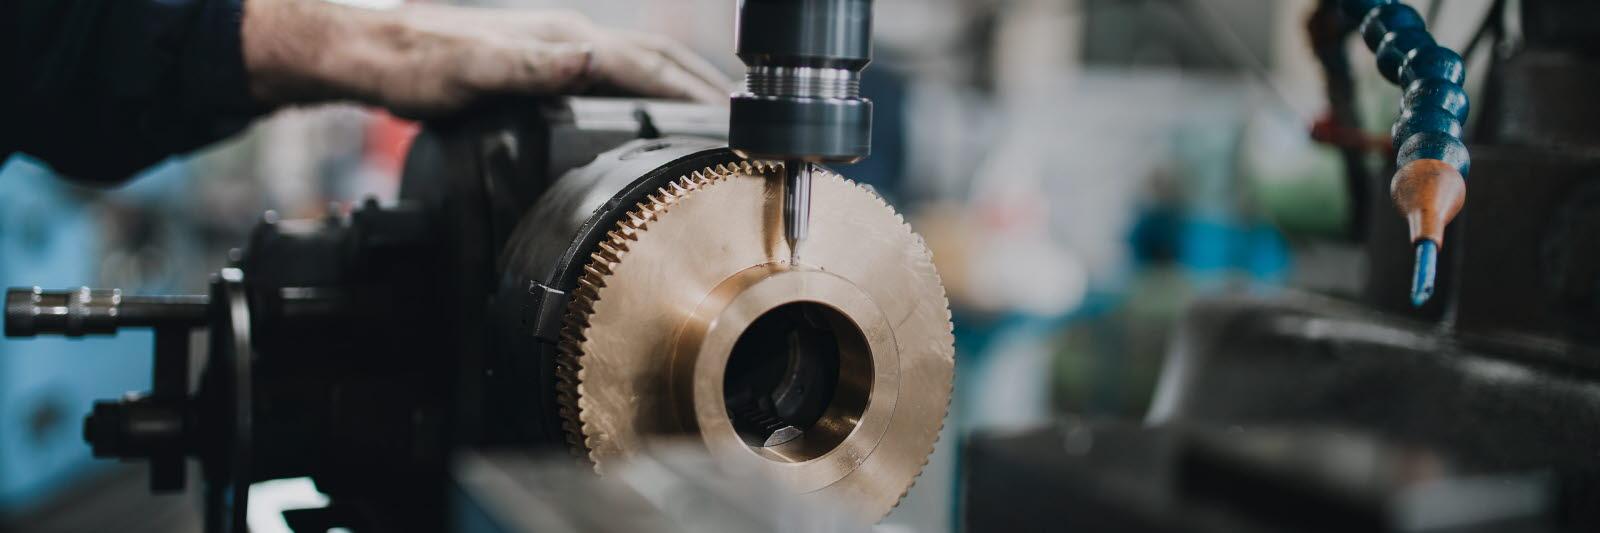 Metallurgy heavy industry